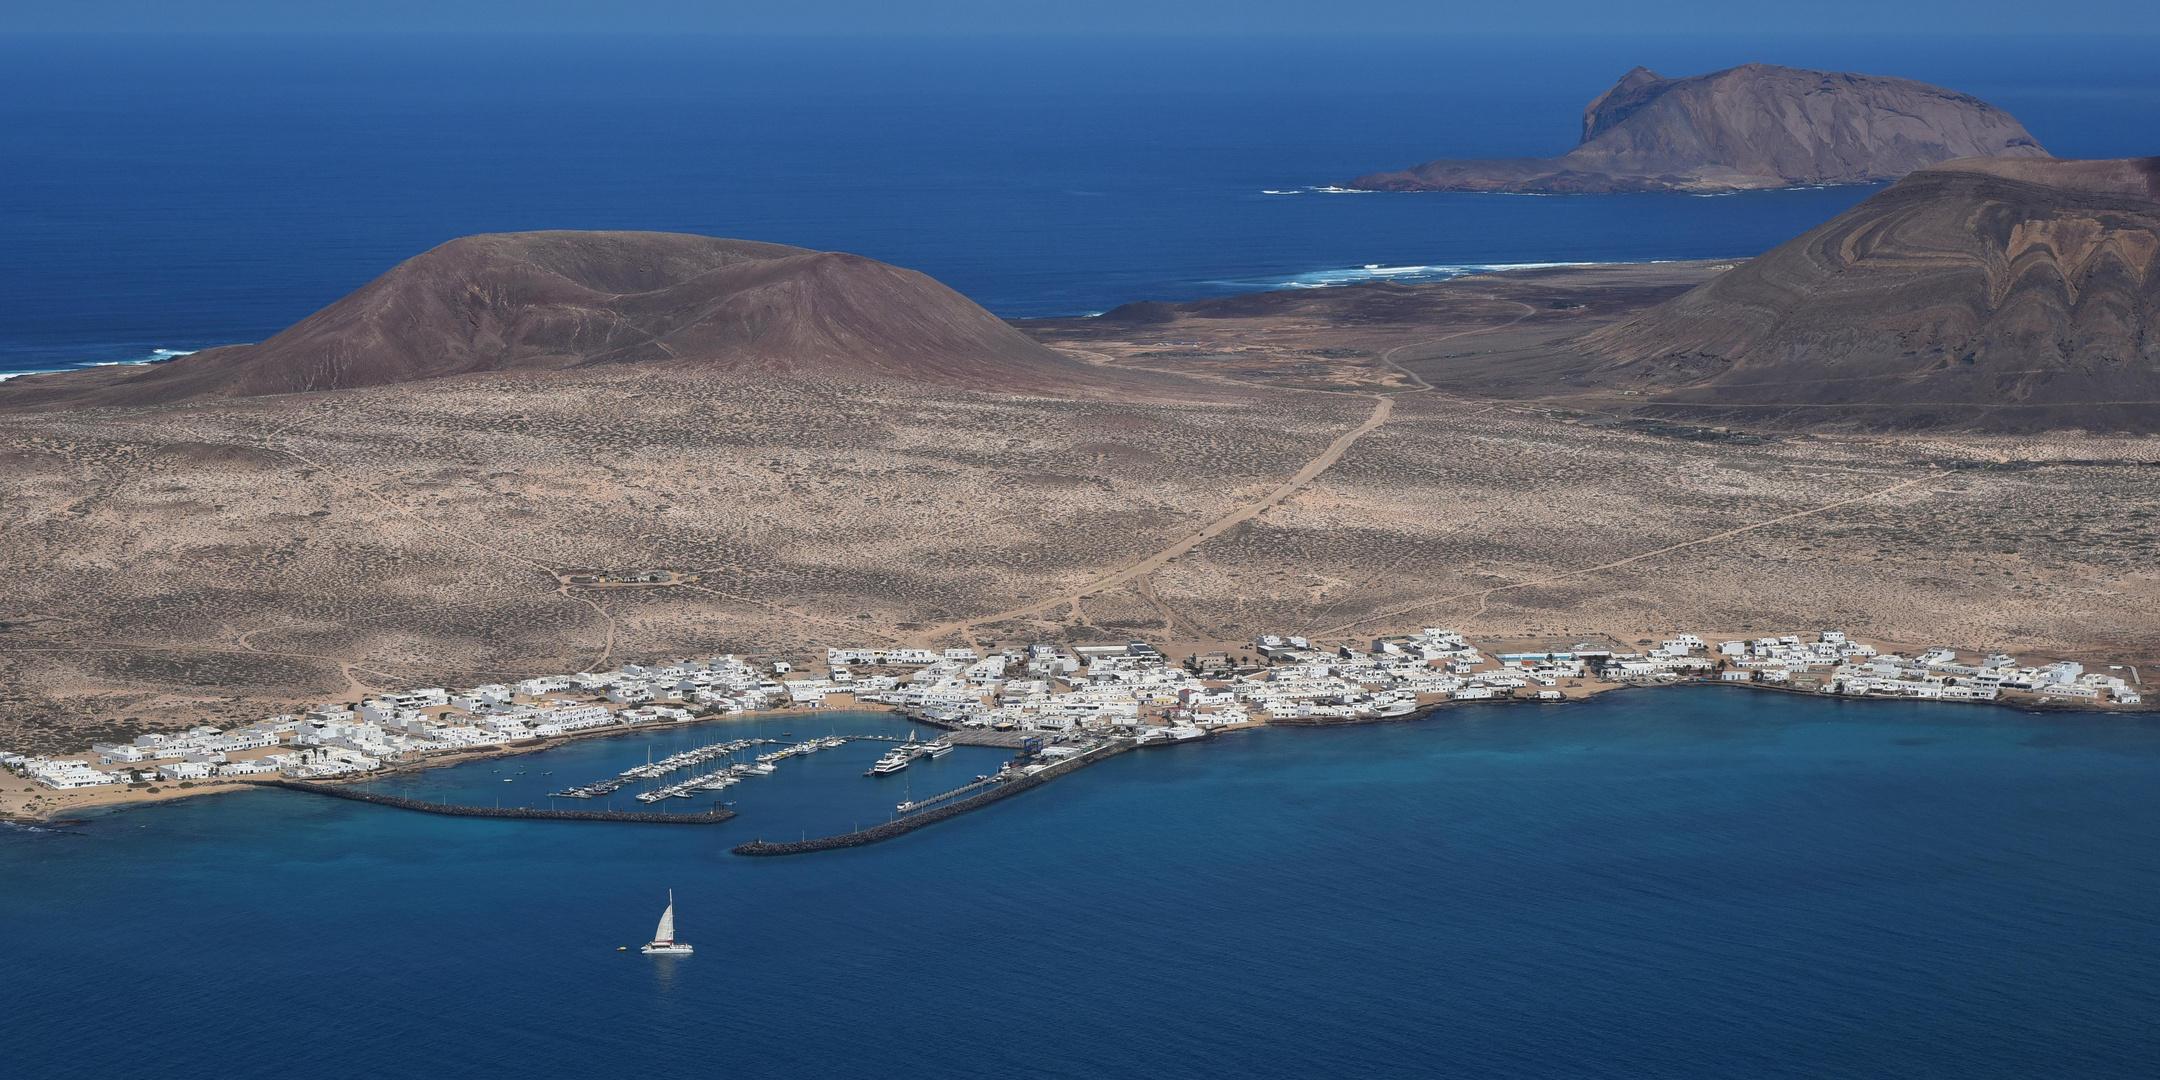 Hafen La Graciosa